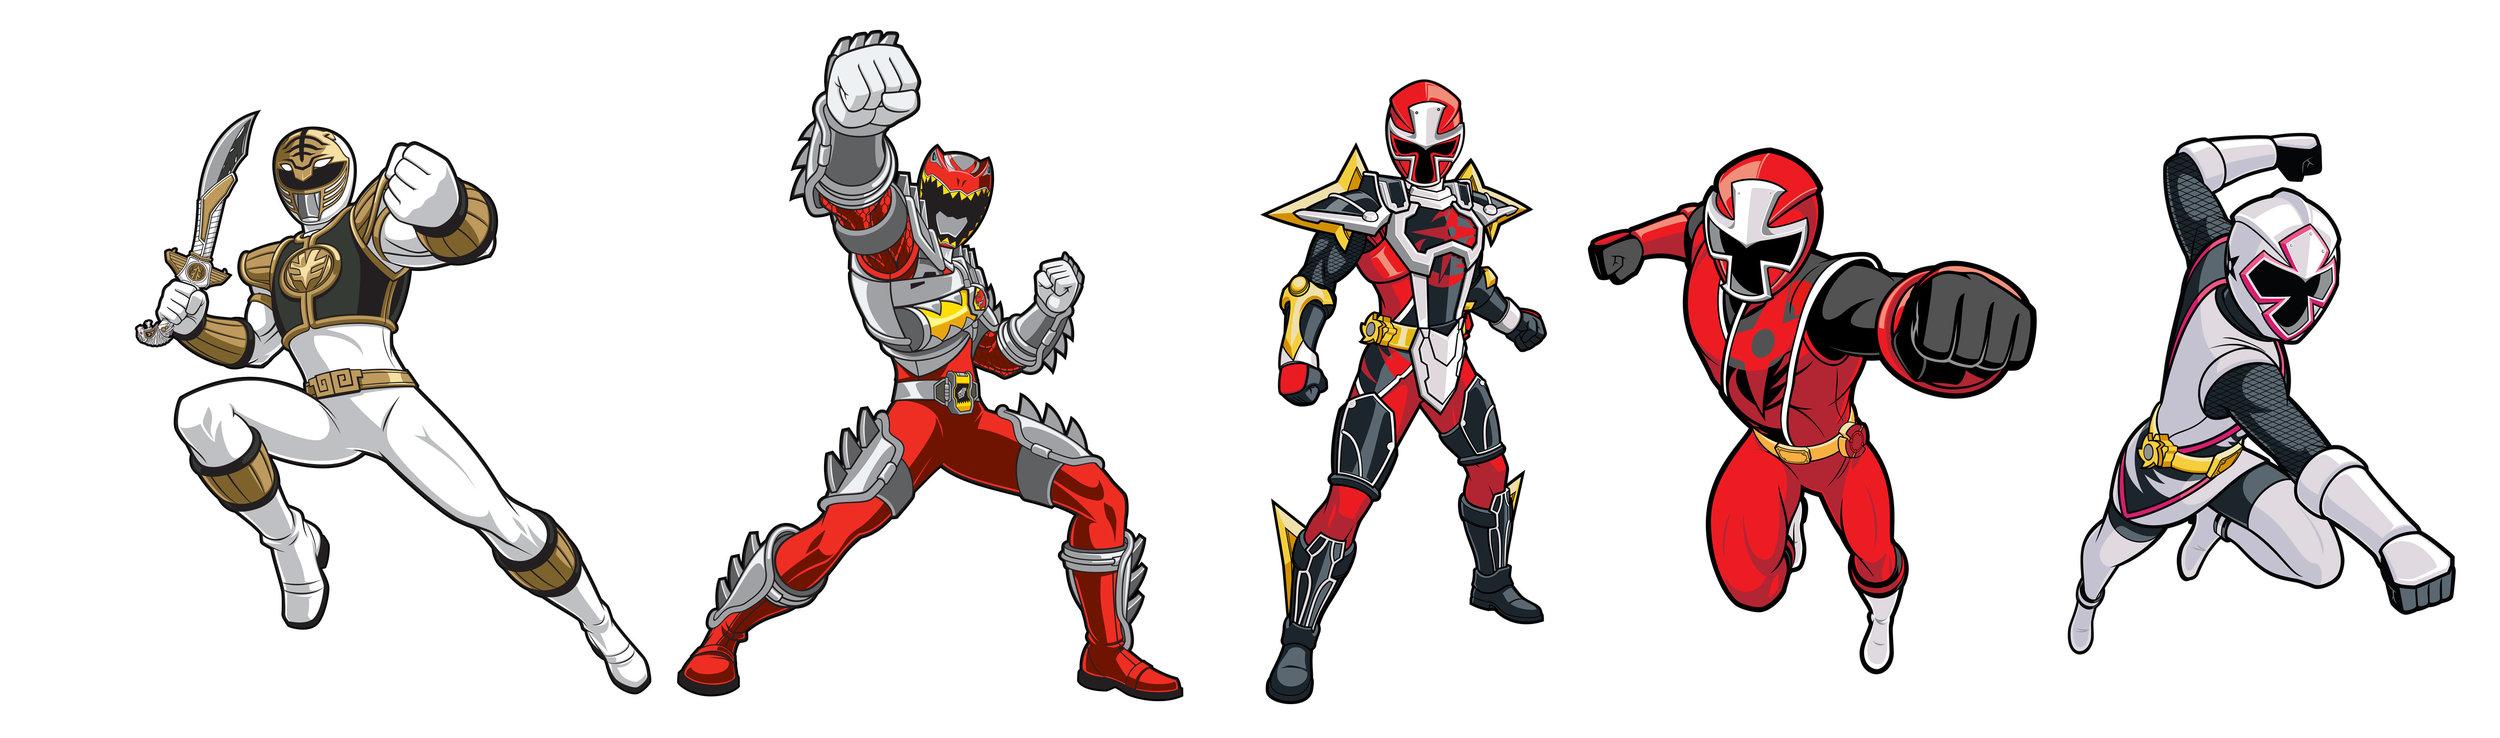 Power_Rangers_Character_Art.jpg